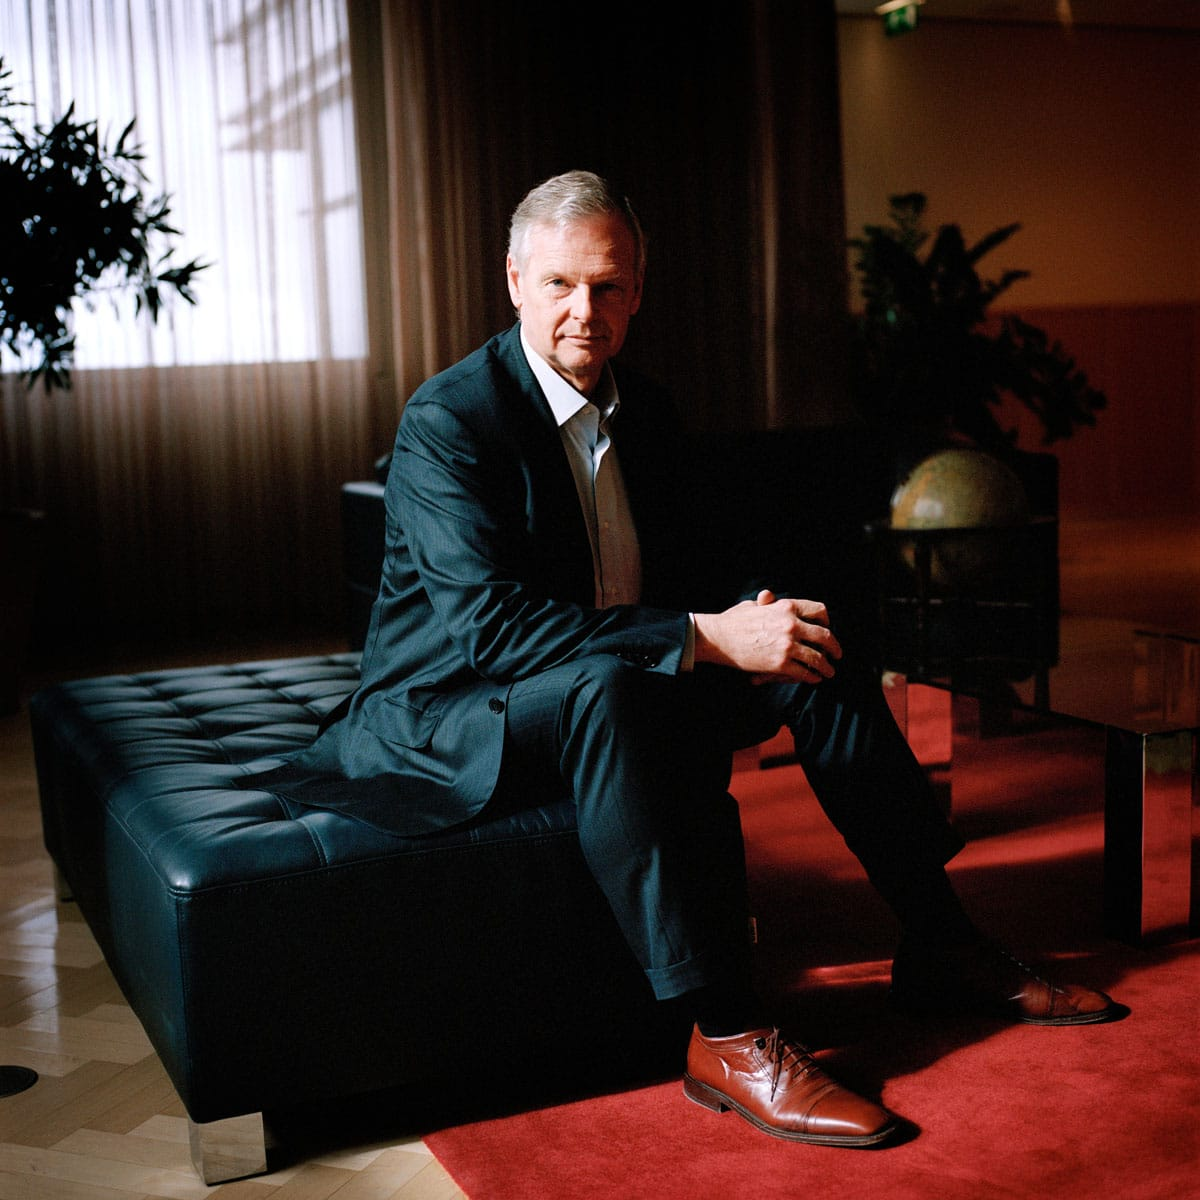 Gerard Kleisterlee, President en chief executive officer van Koninklijke Philips Electronics N.V. PHOTO AND COPYRIGHT ROGER CREMERS